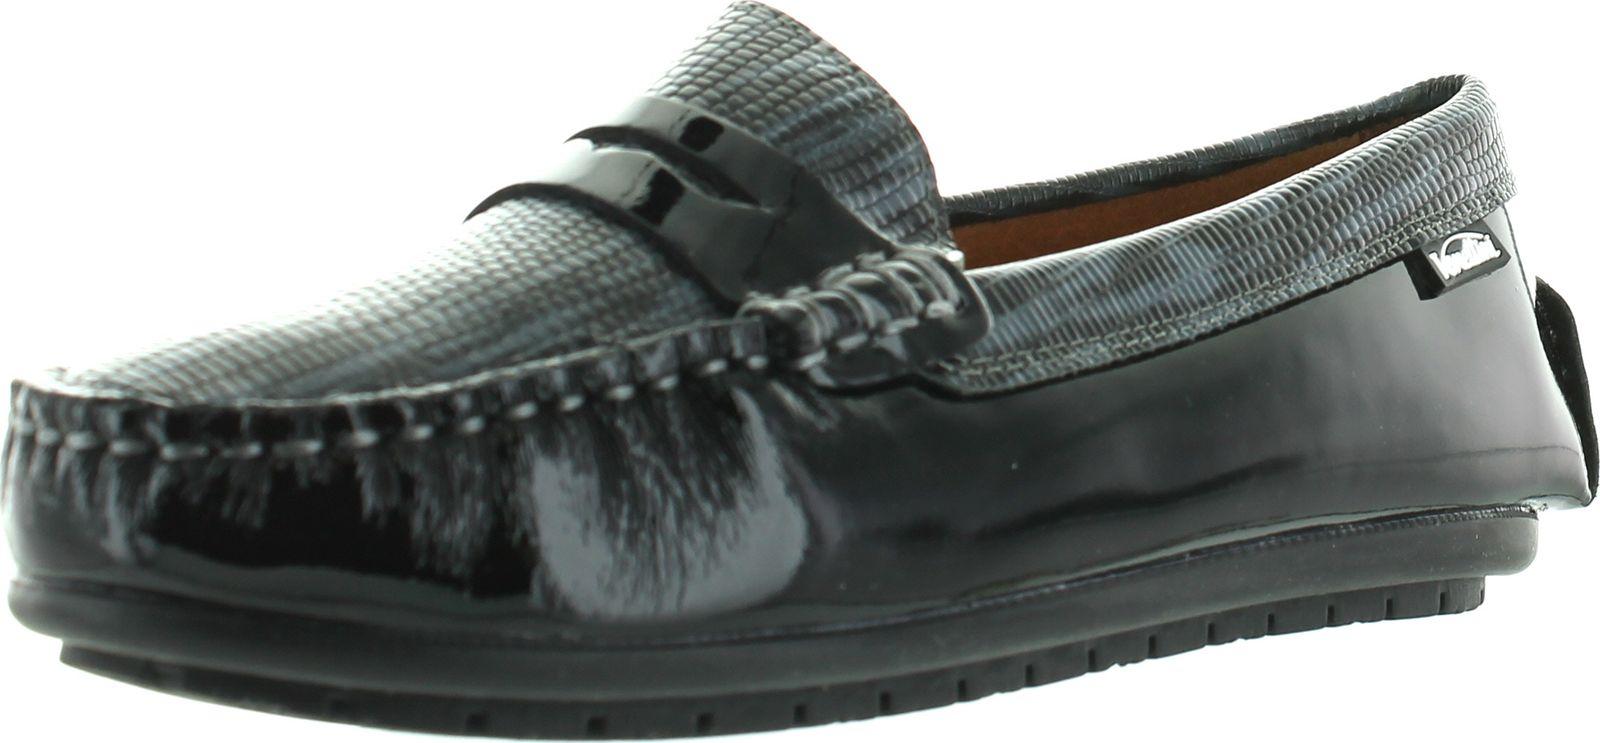 venettini 55 savor designer fashion loafers shoes ebay